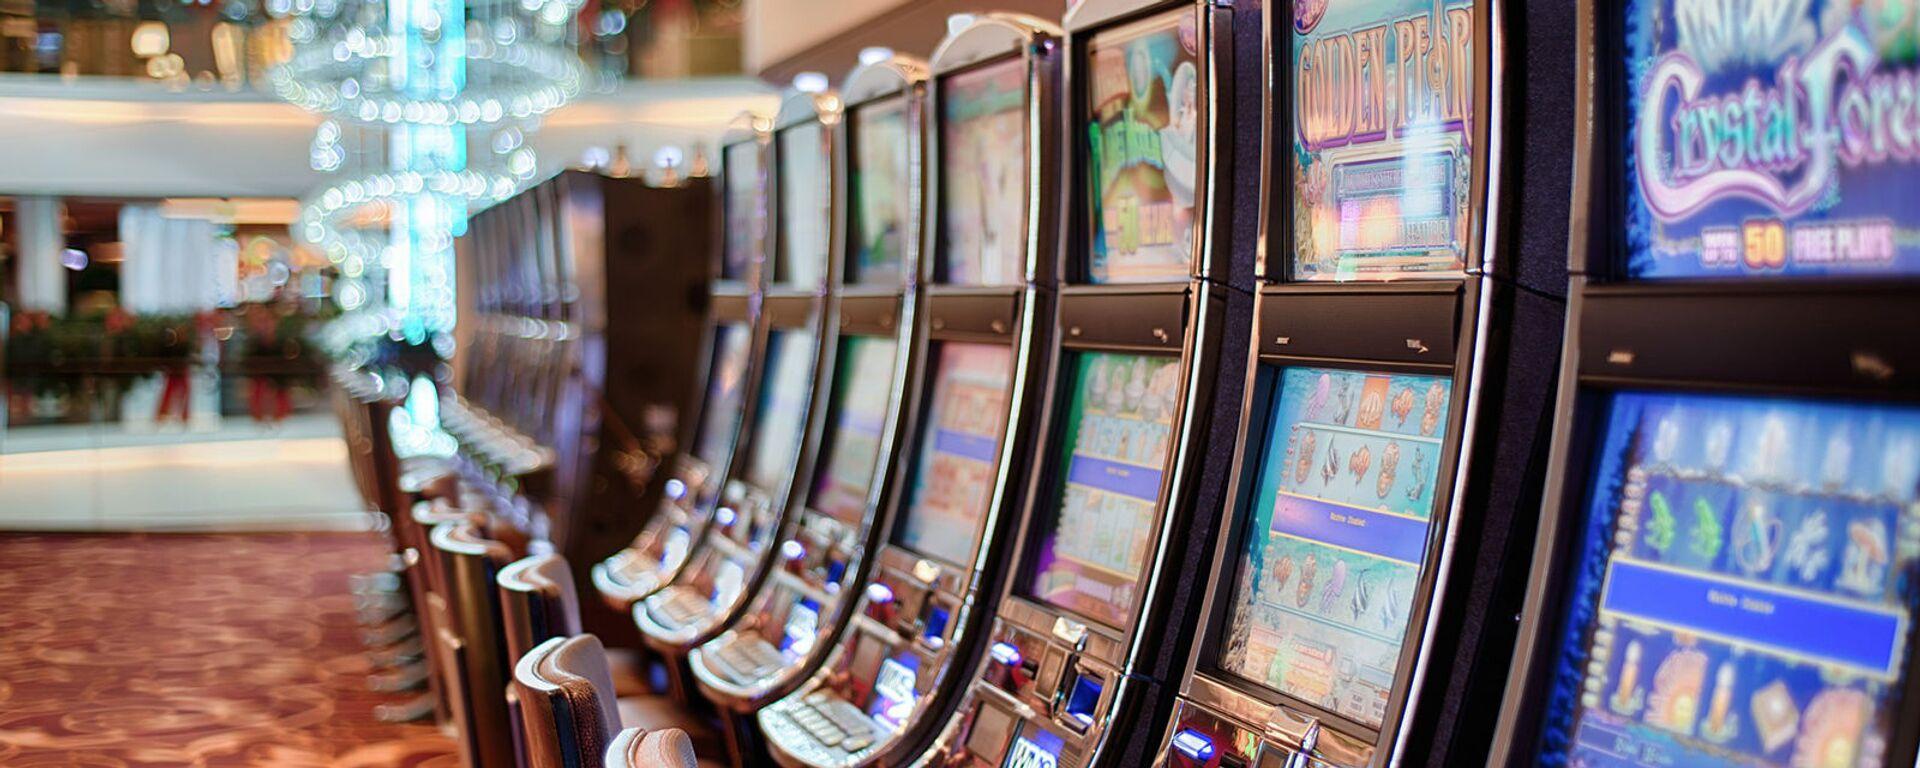 Игровые автоматы в казино - Sputnik Արմենիա, 1920, 24.03.2021